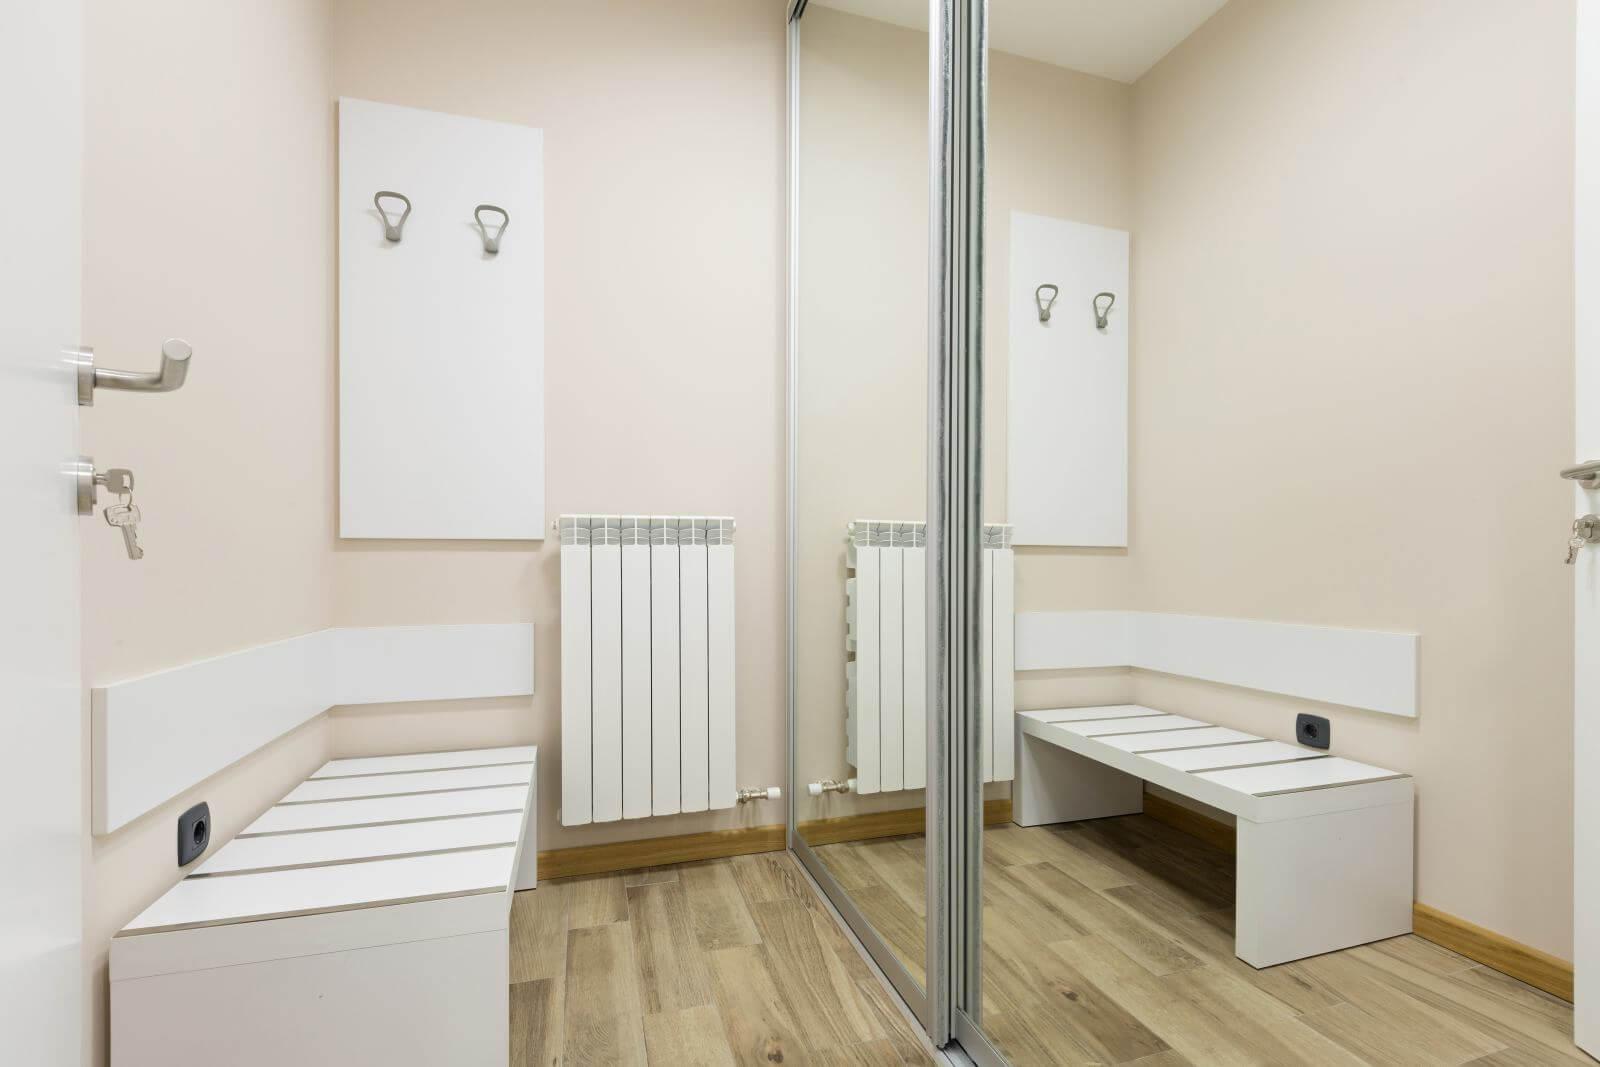 Corridor with closet and mirror